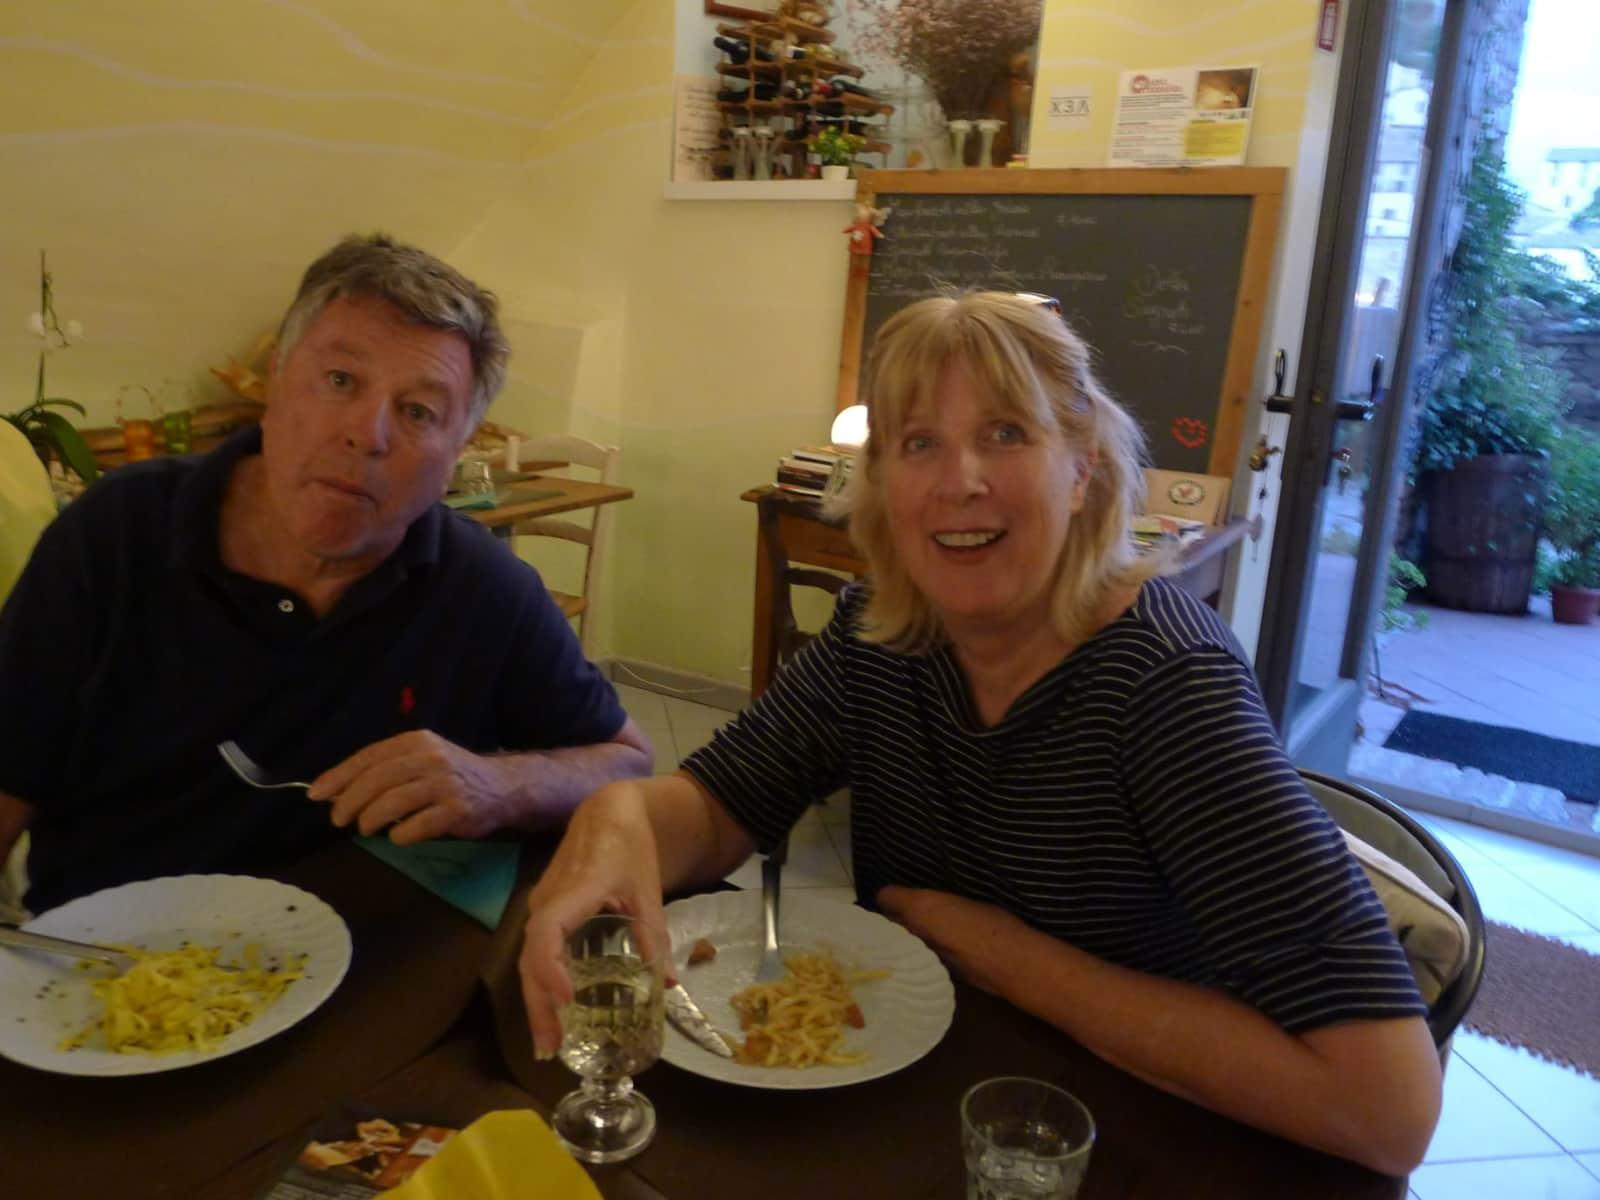 Jayne & Monty from Sydney, New South Wales, Australia